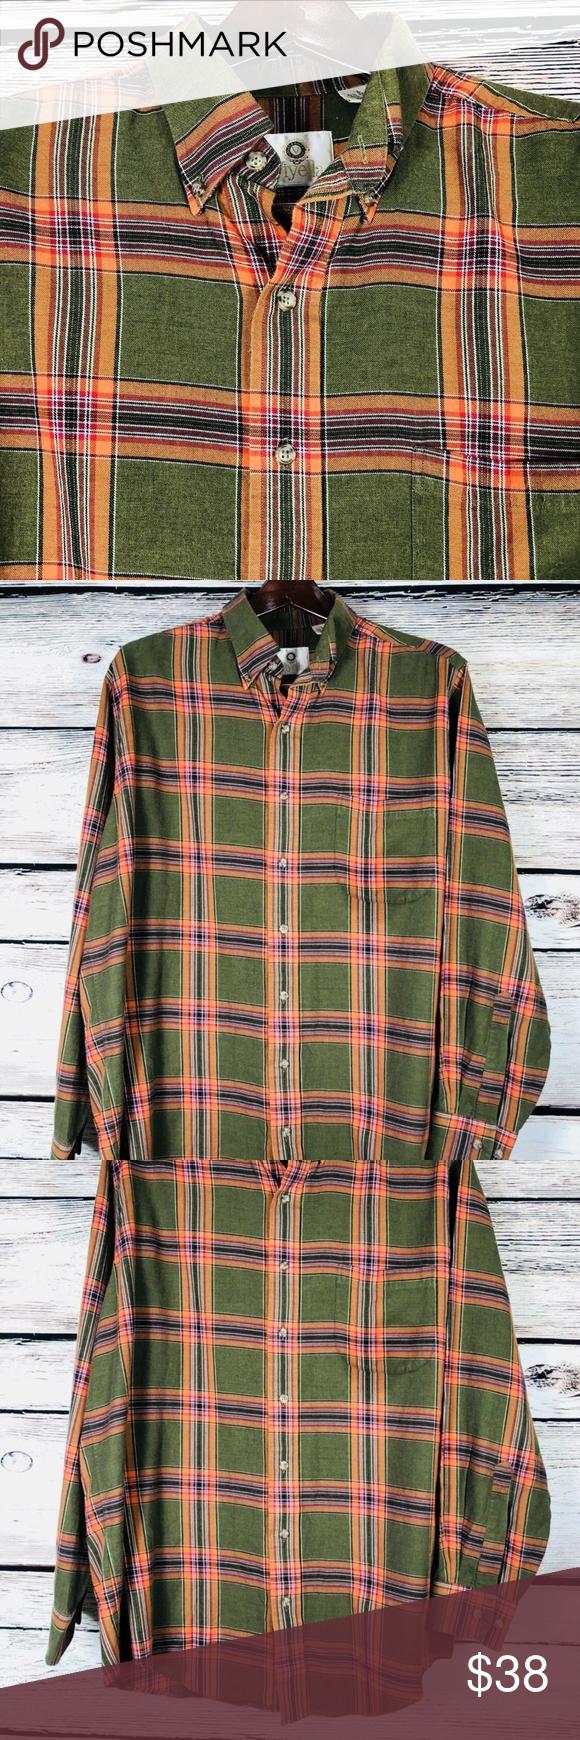 Orange flannel jacket  Viyella Flannel Shirt Green Orange Plaid Large  My Posh Closet